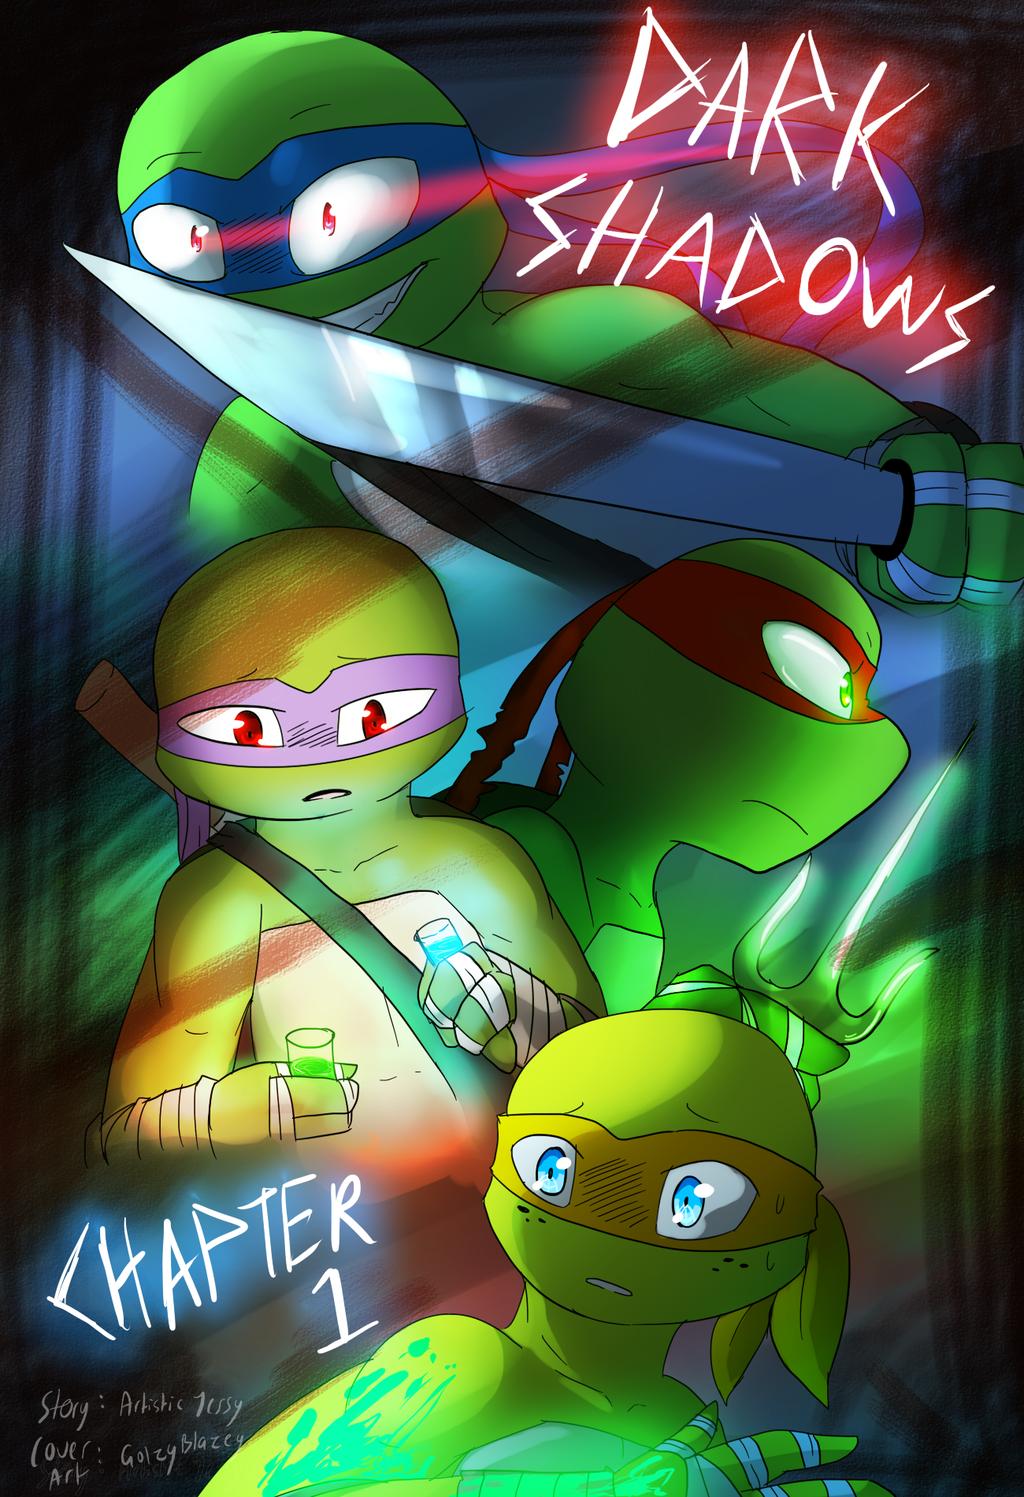 acbc5d927da Chapter One Tmnt Comics, Chapter One, Shadows, Ninja, Darkness, Ninjas